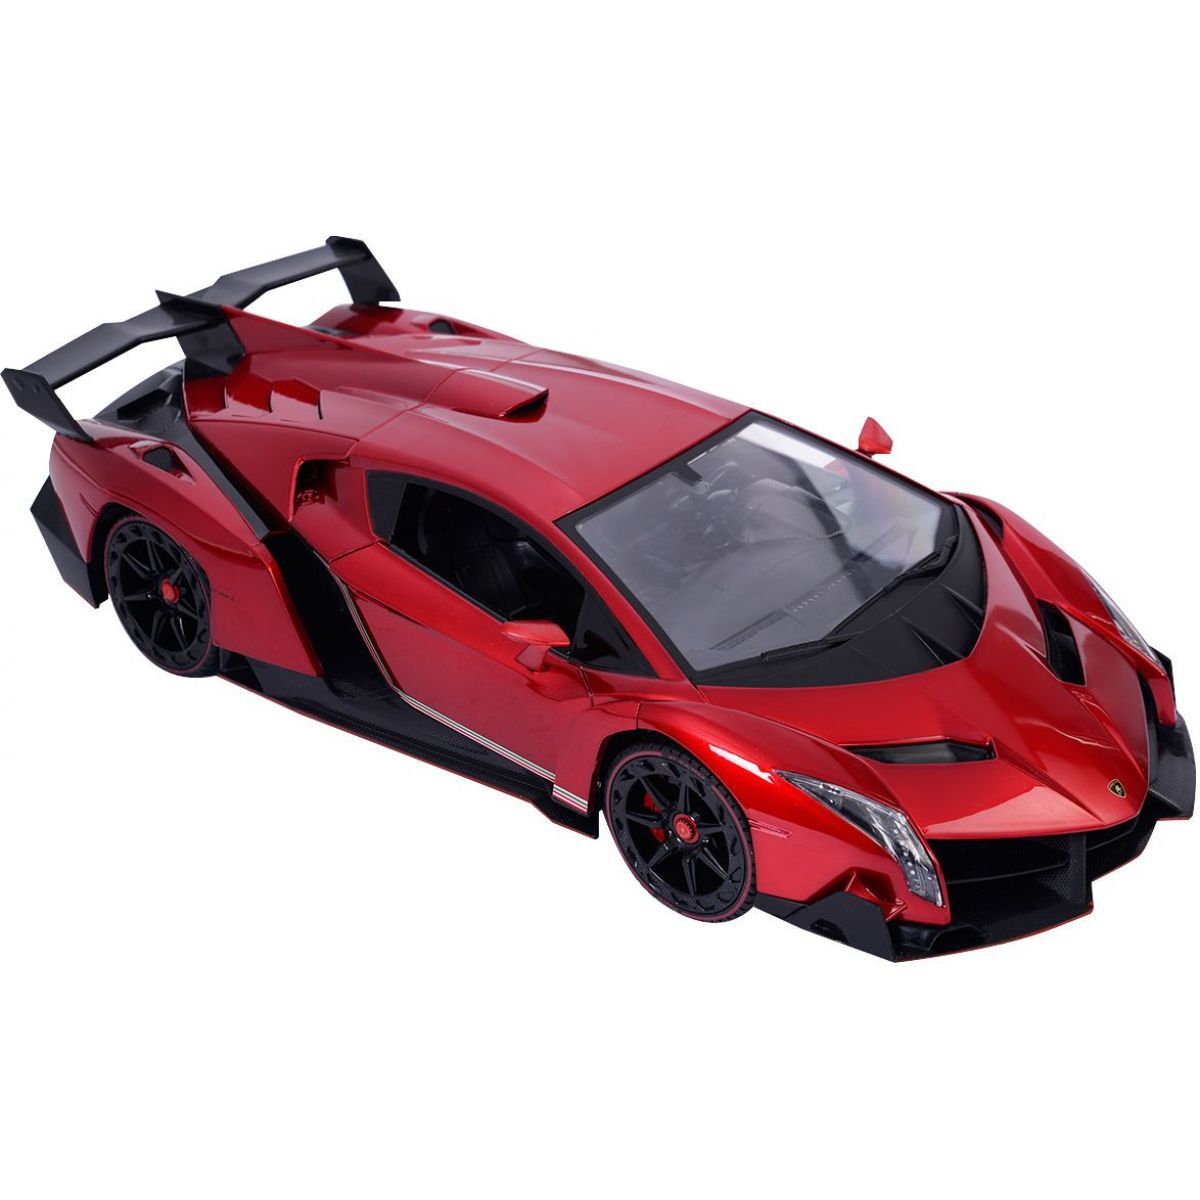 Ep Line Závodní RC auto Lamborghini Veneno 1:12 EPLINE